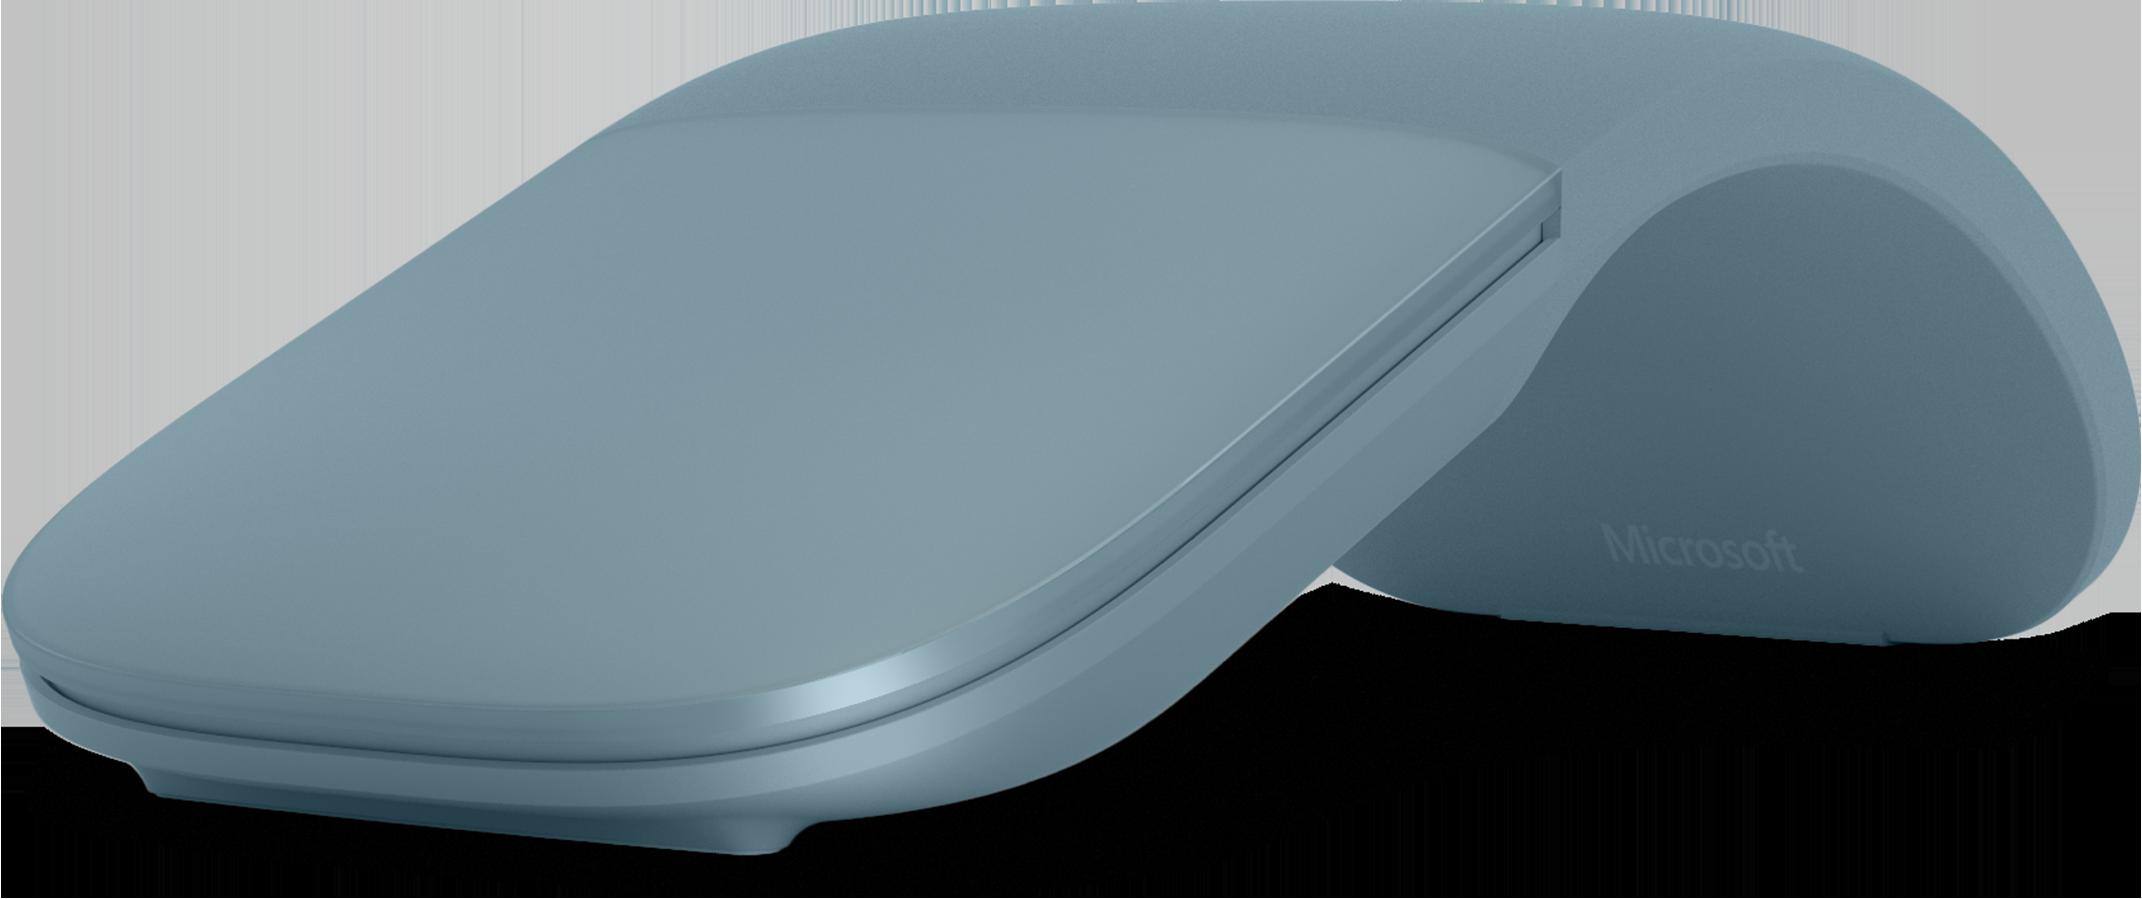 Surface Arc Mouse Aqua